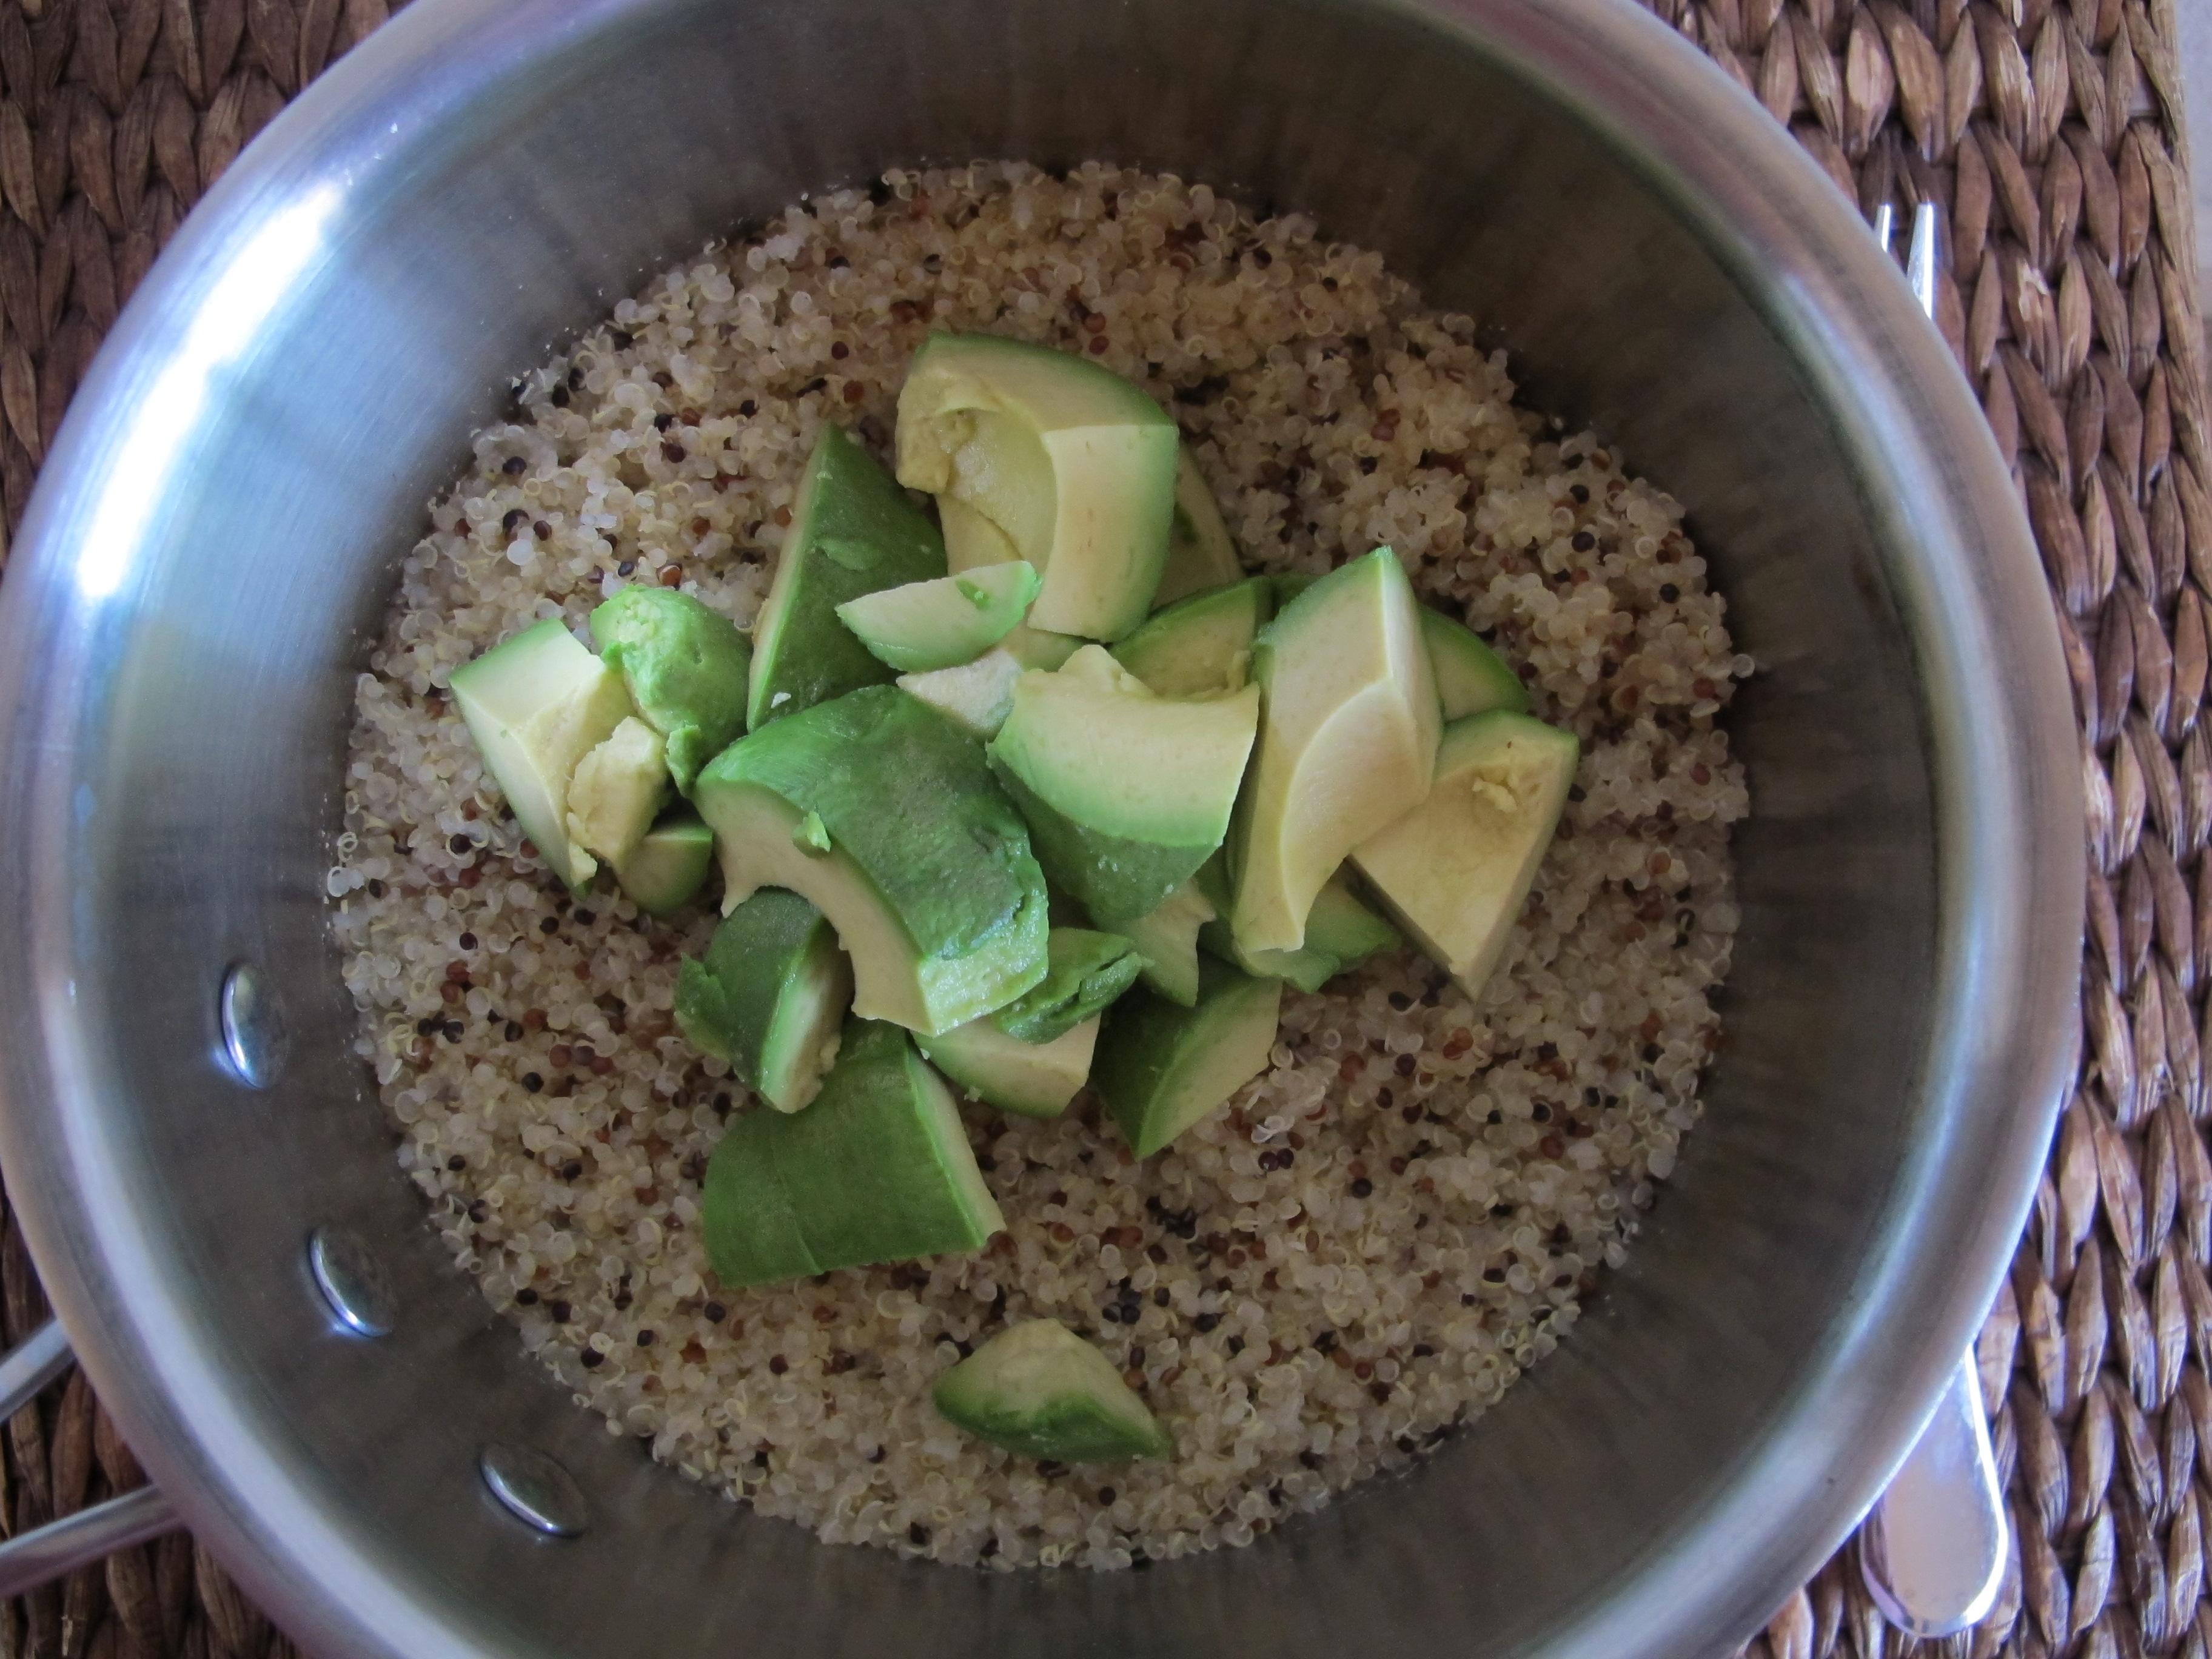 Sweet Potato and Pinto Bean Skillet with Avocado Quinoa Mash